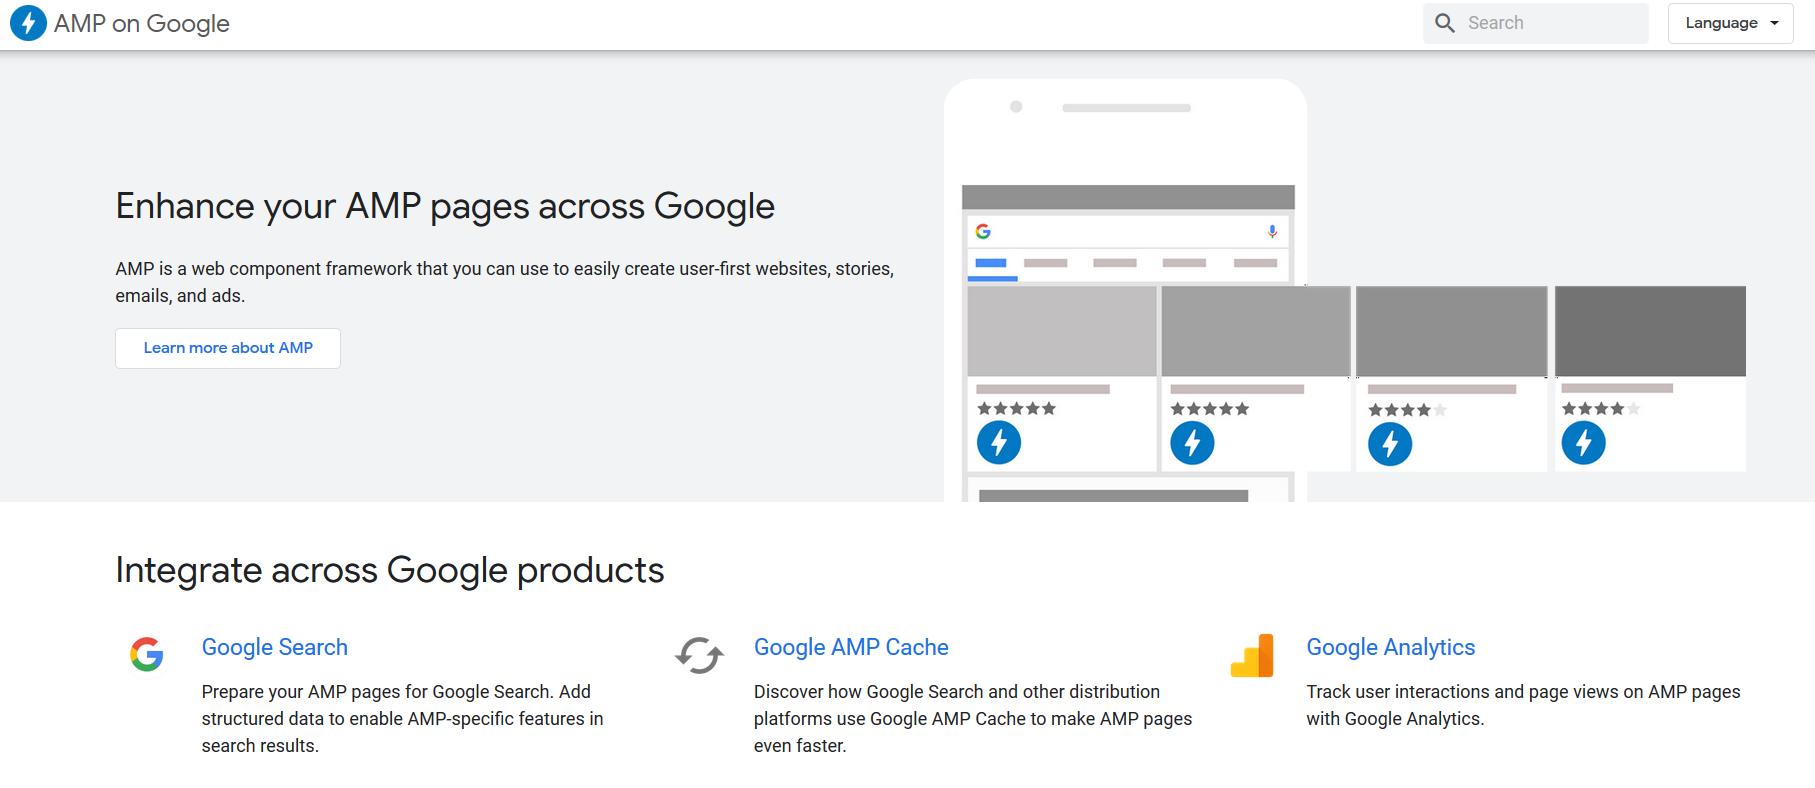 AMP on Google page screenshot